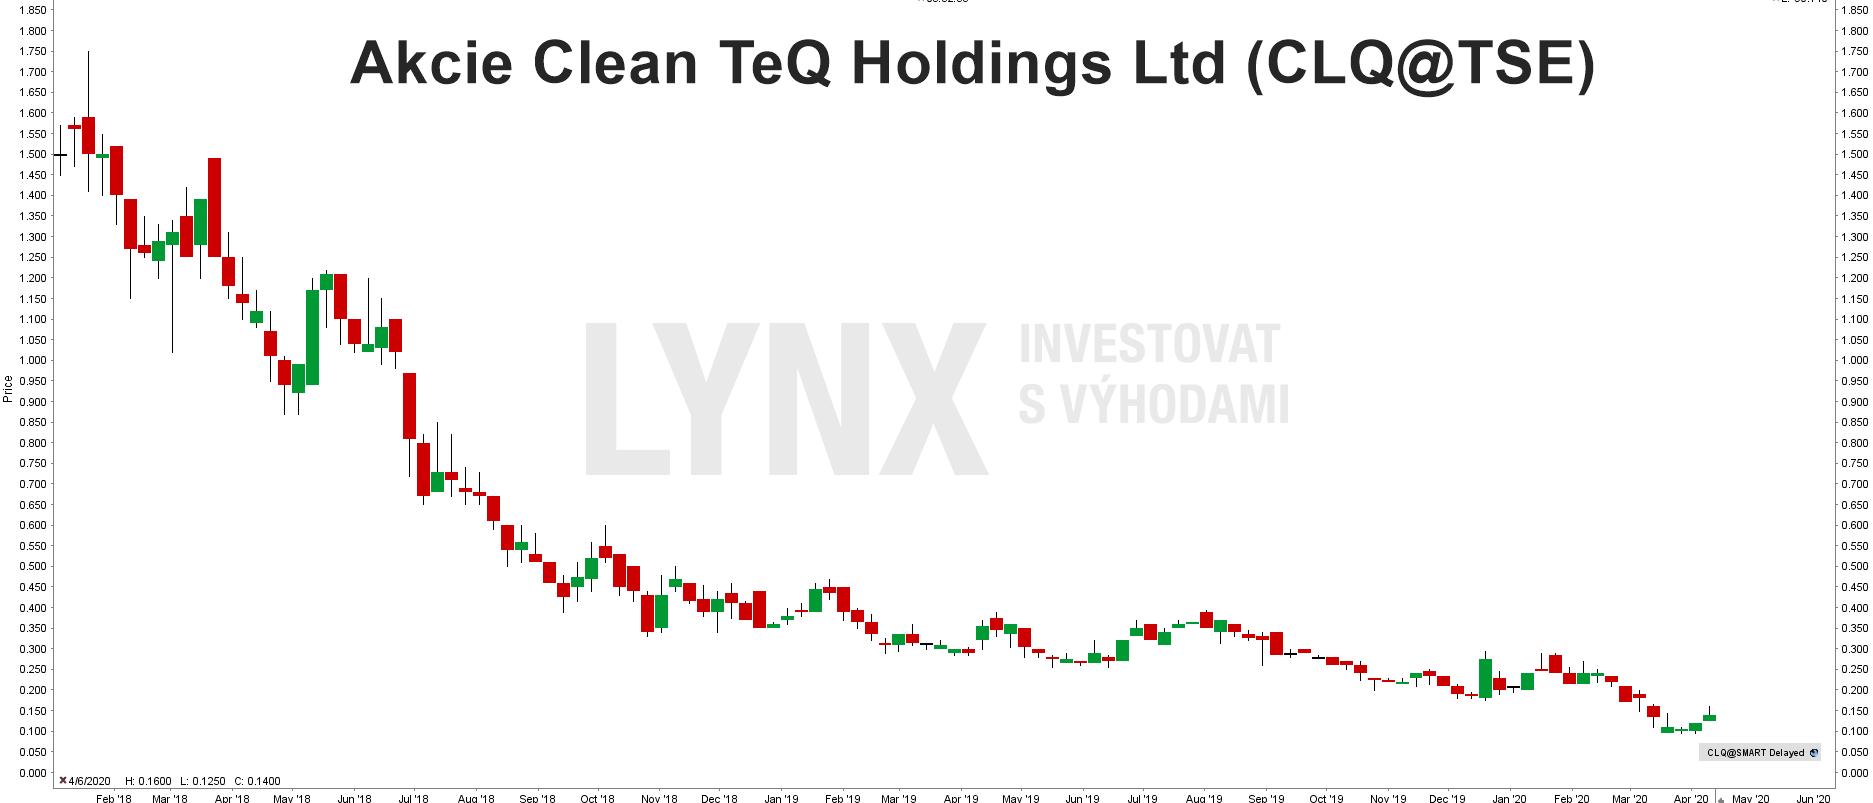 Graf akcie Clean TeQ Holdings (CLQ)